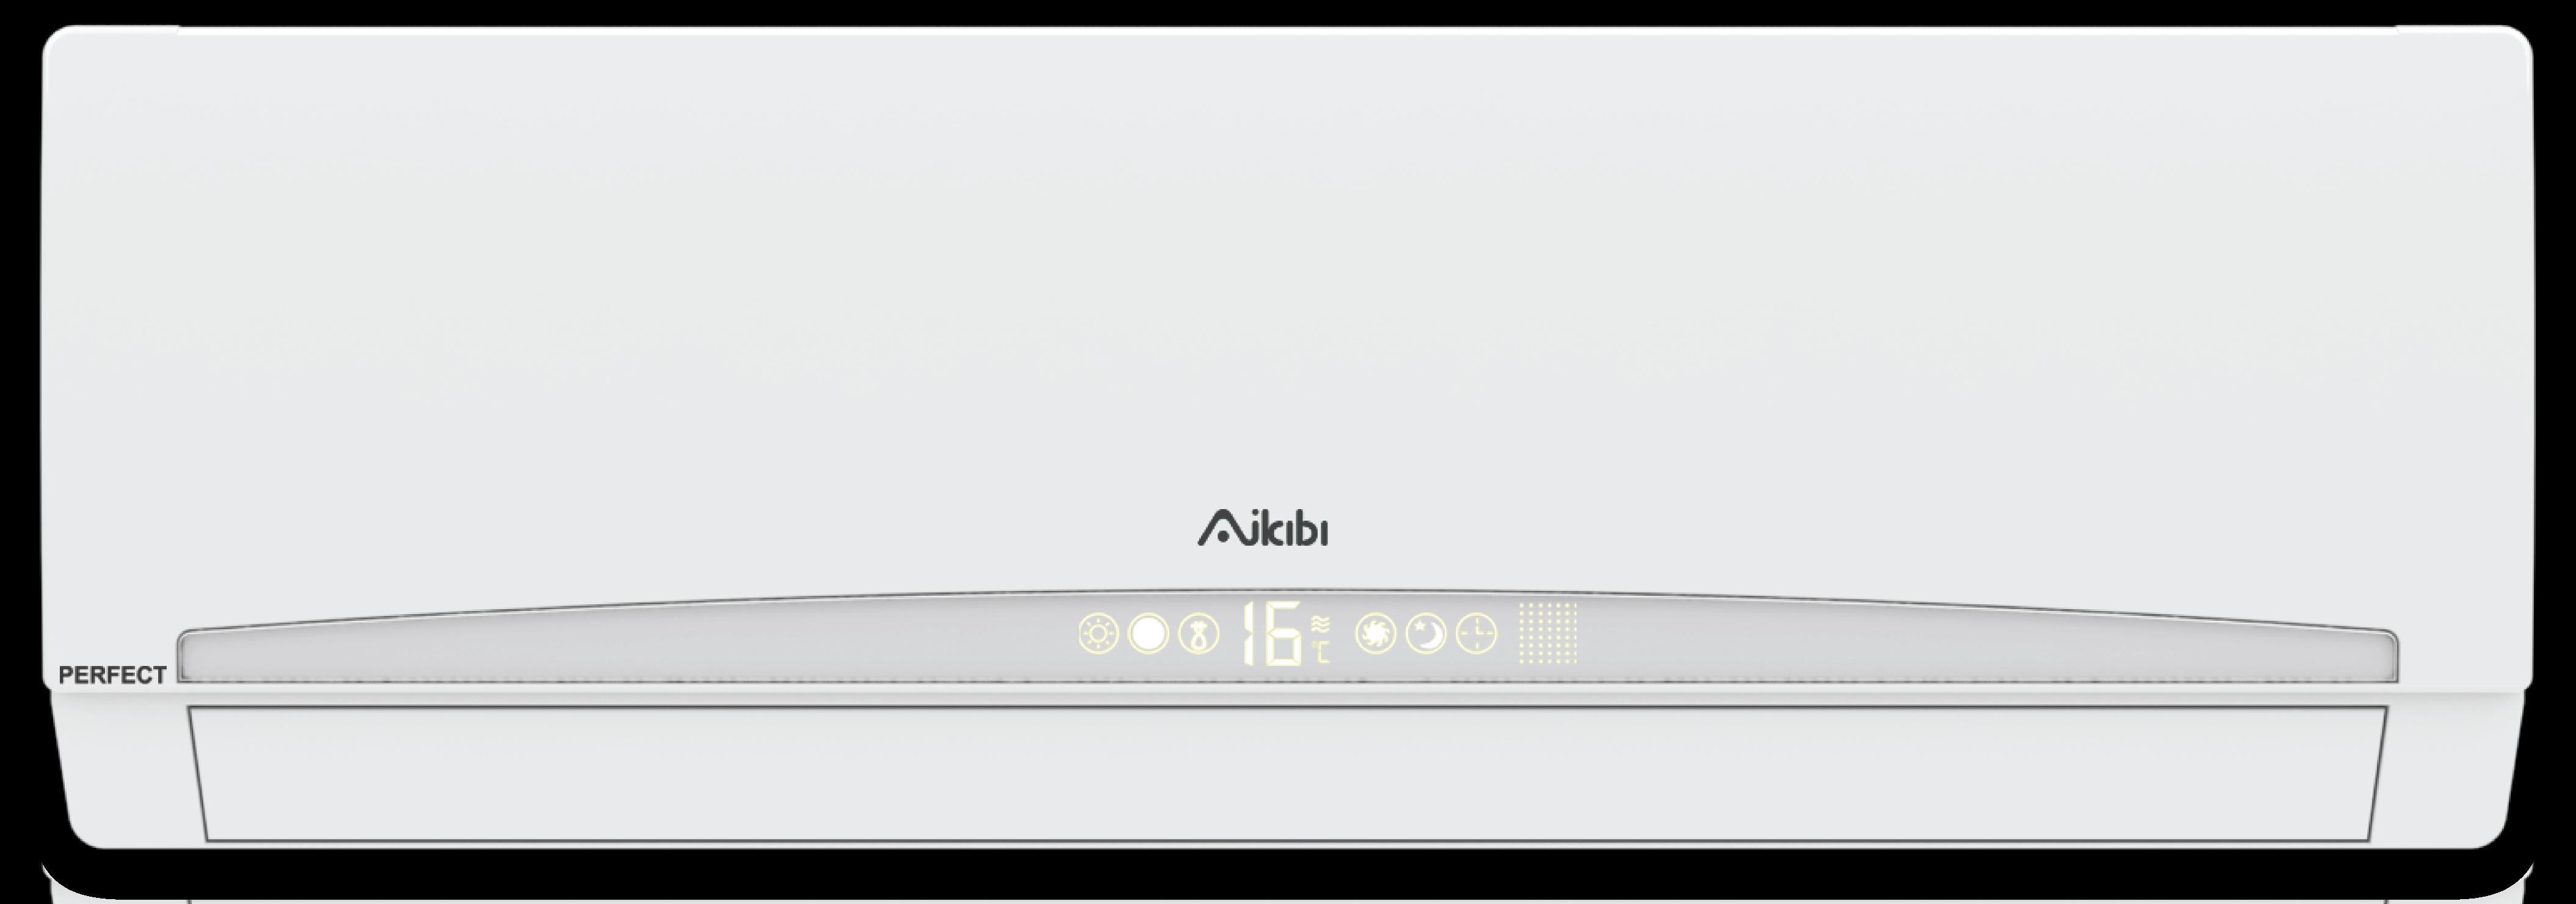 MÁY LẠNH AIKIBI 1.5 HP DC INVERTER  HWS12C-SF